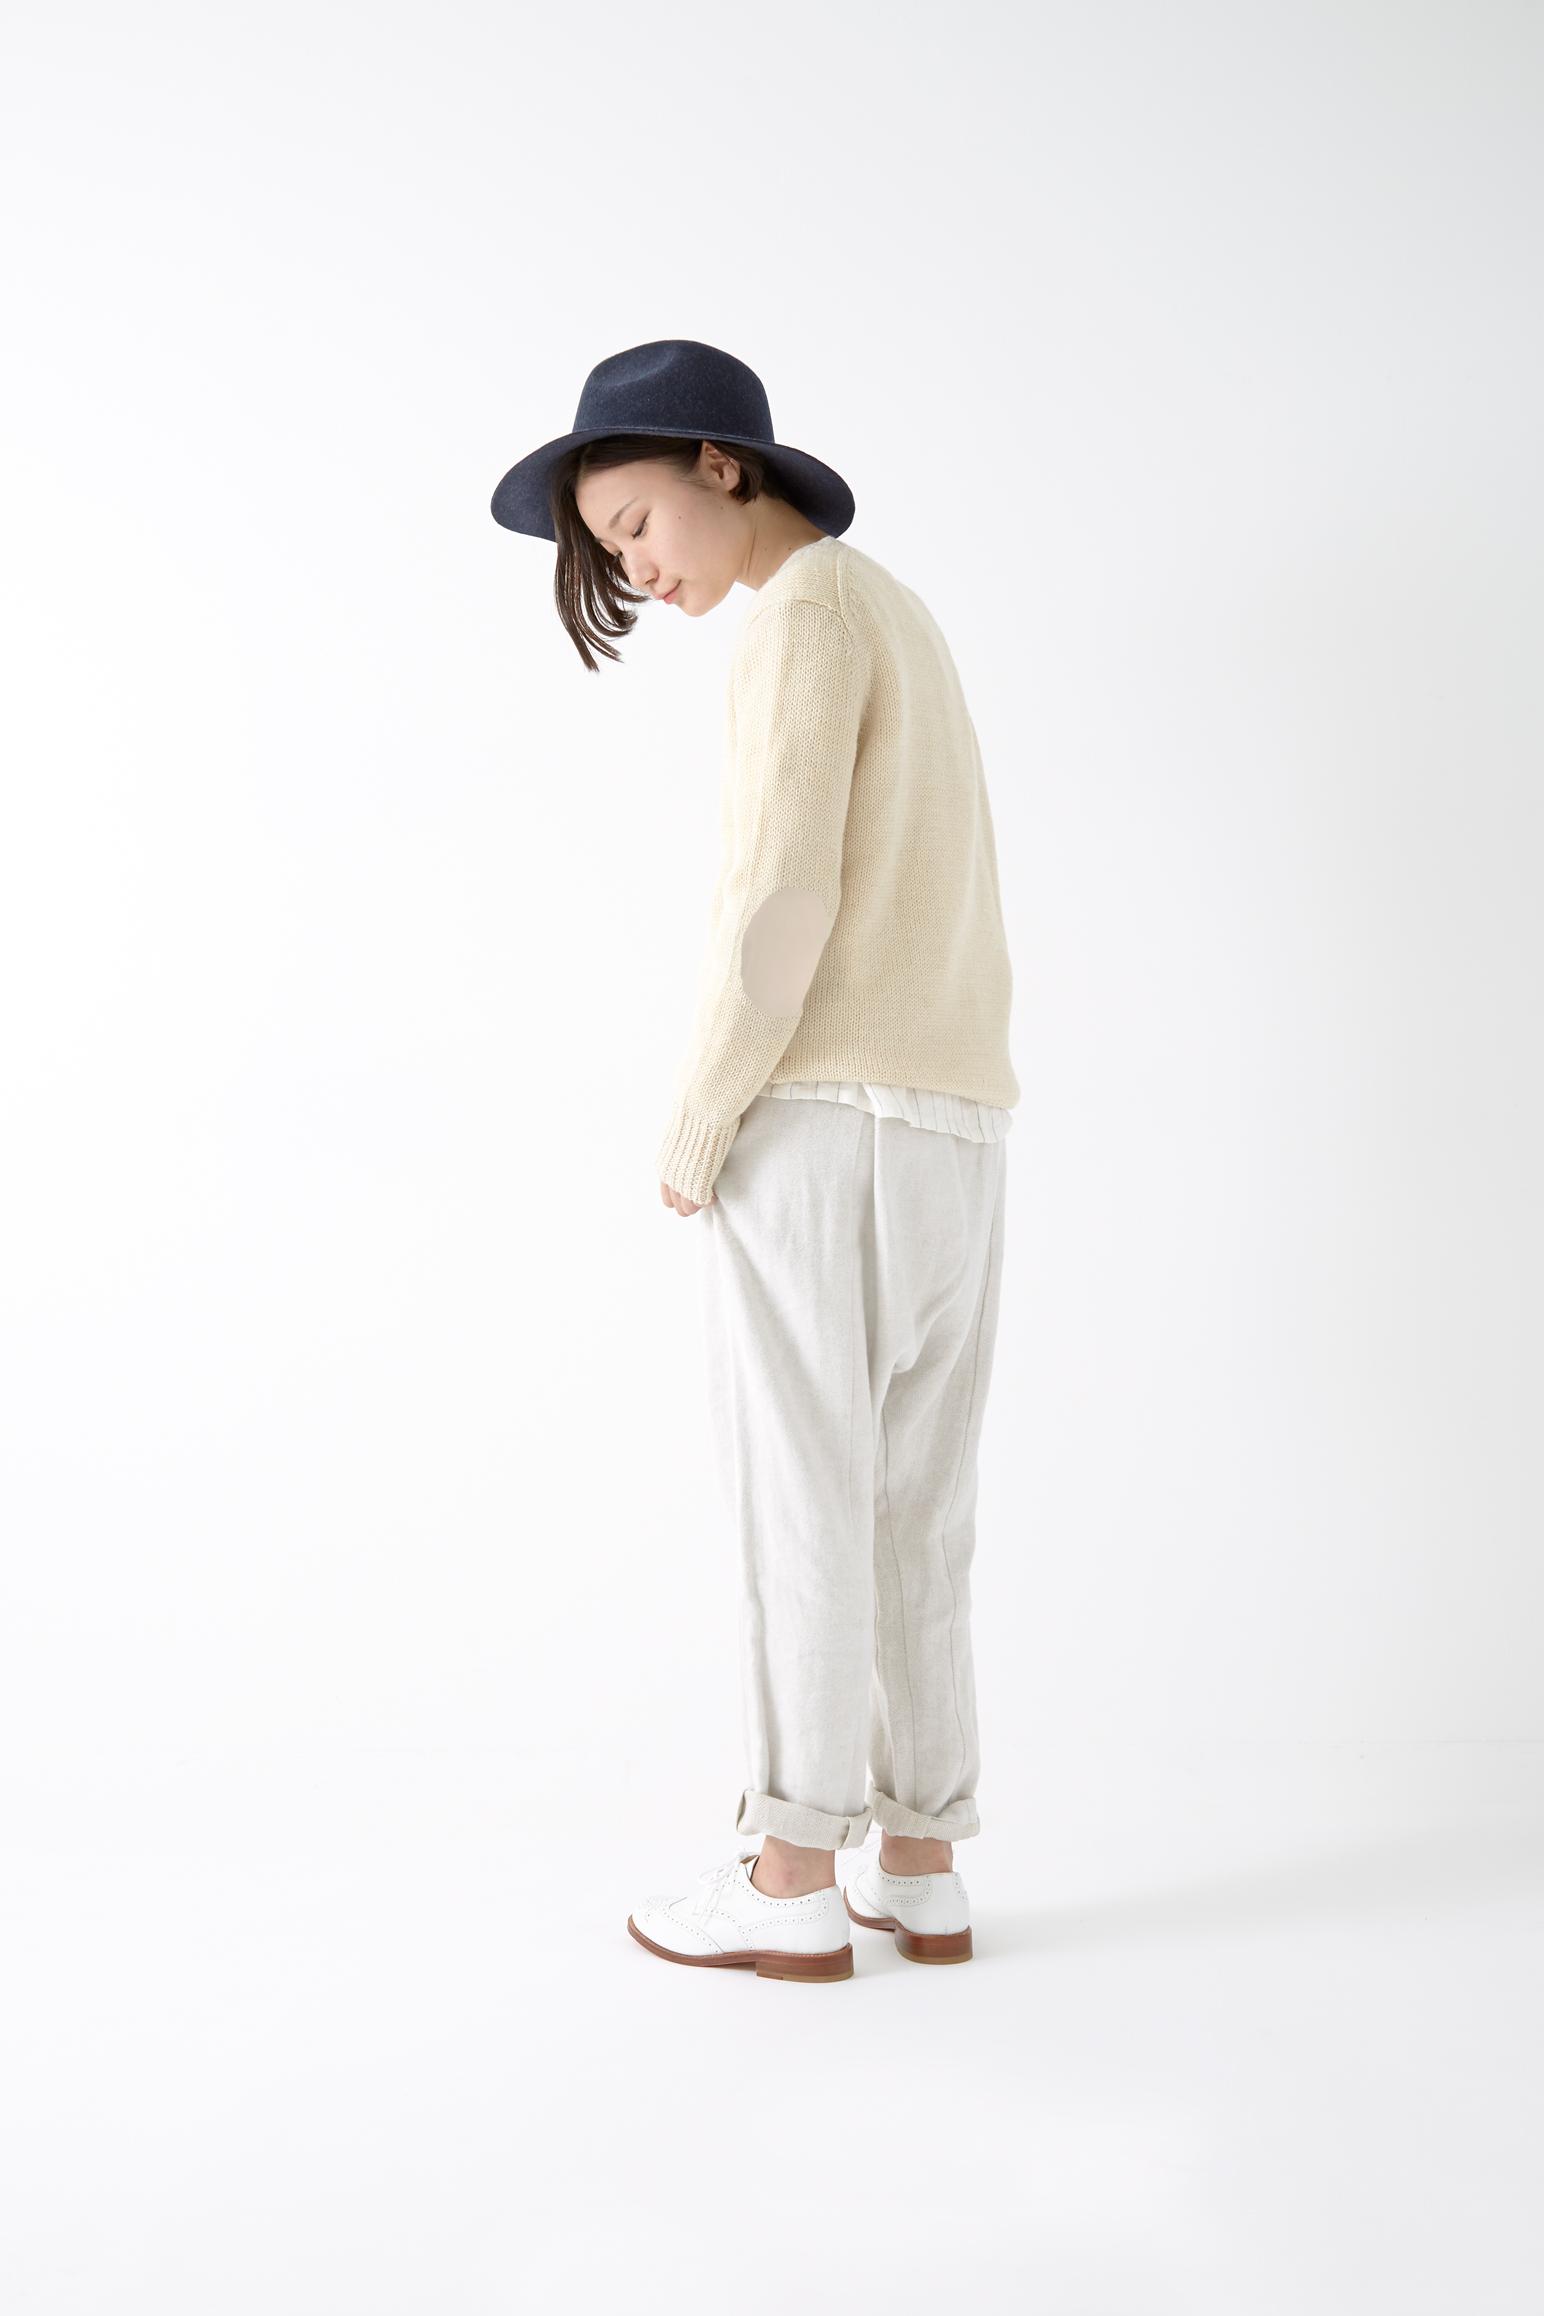 siiwa 2014-15A/W style01-03